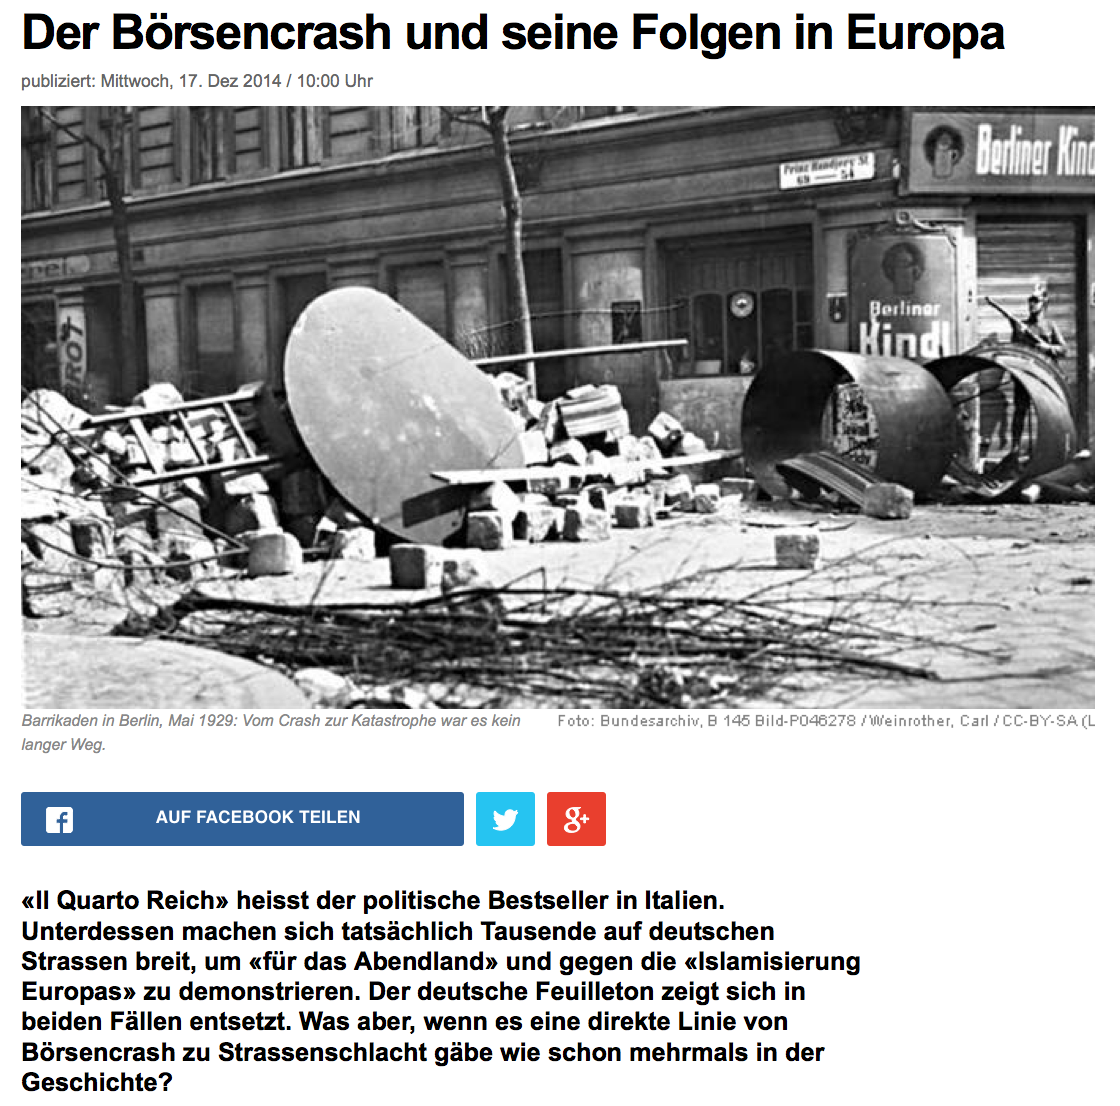 News 17.12.2014